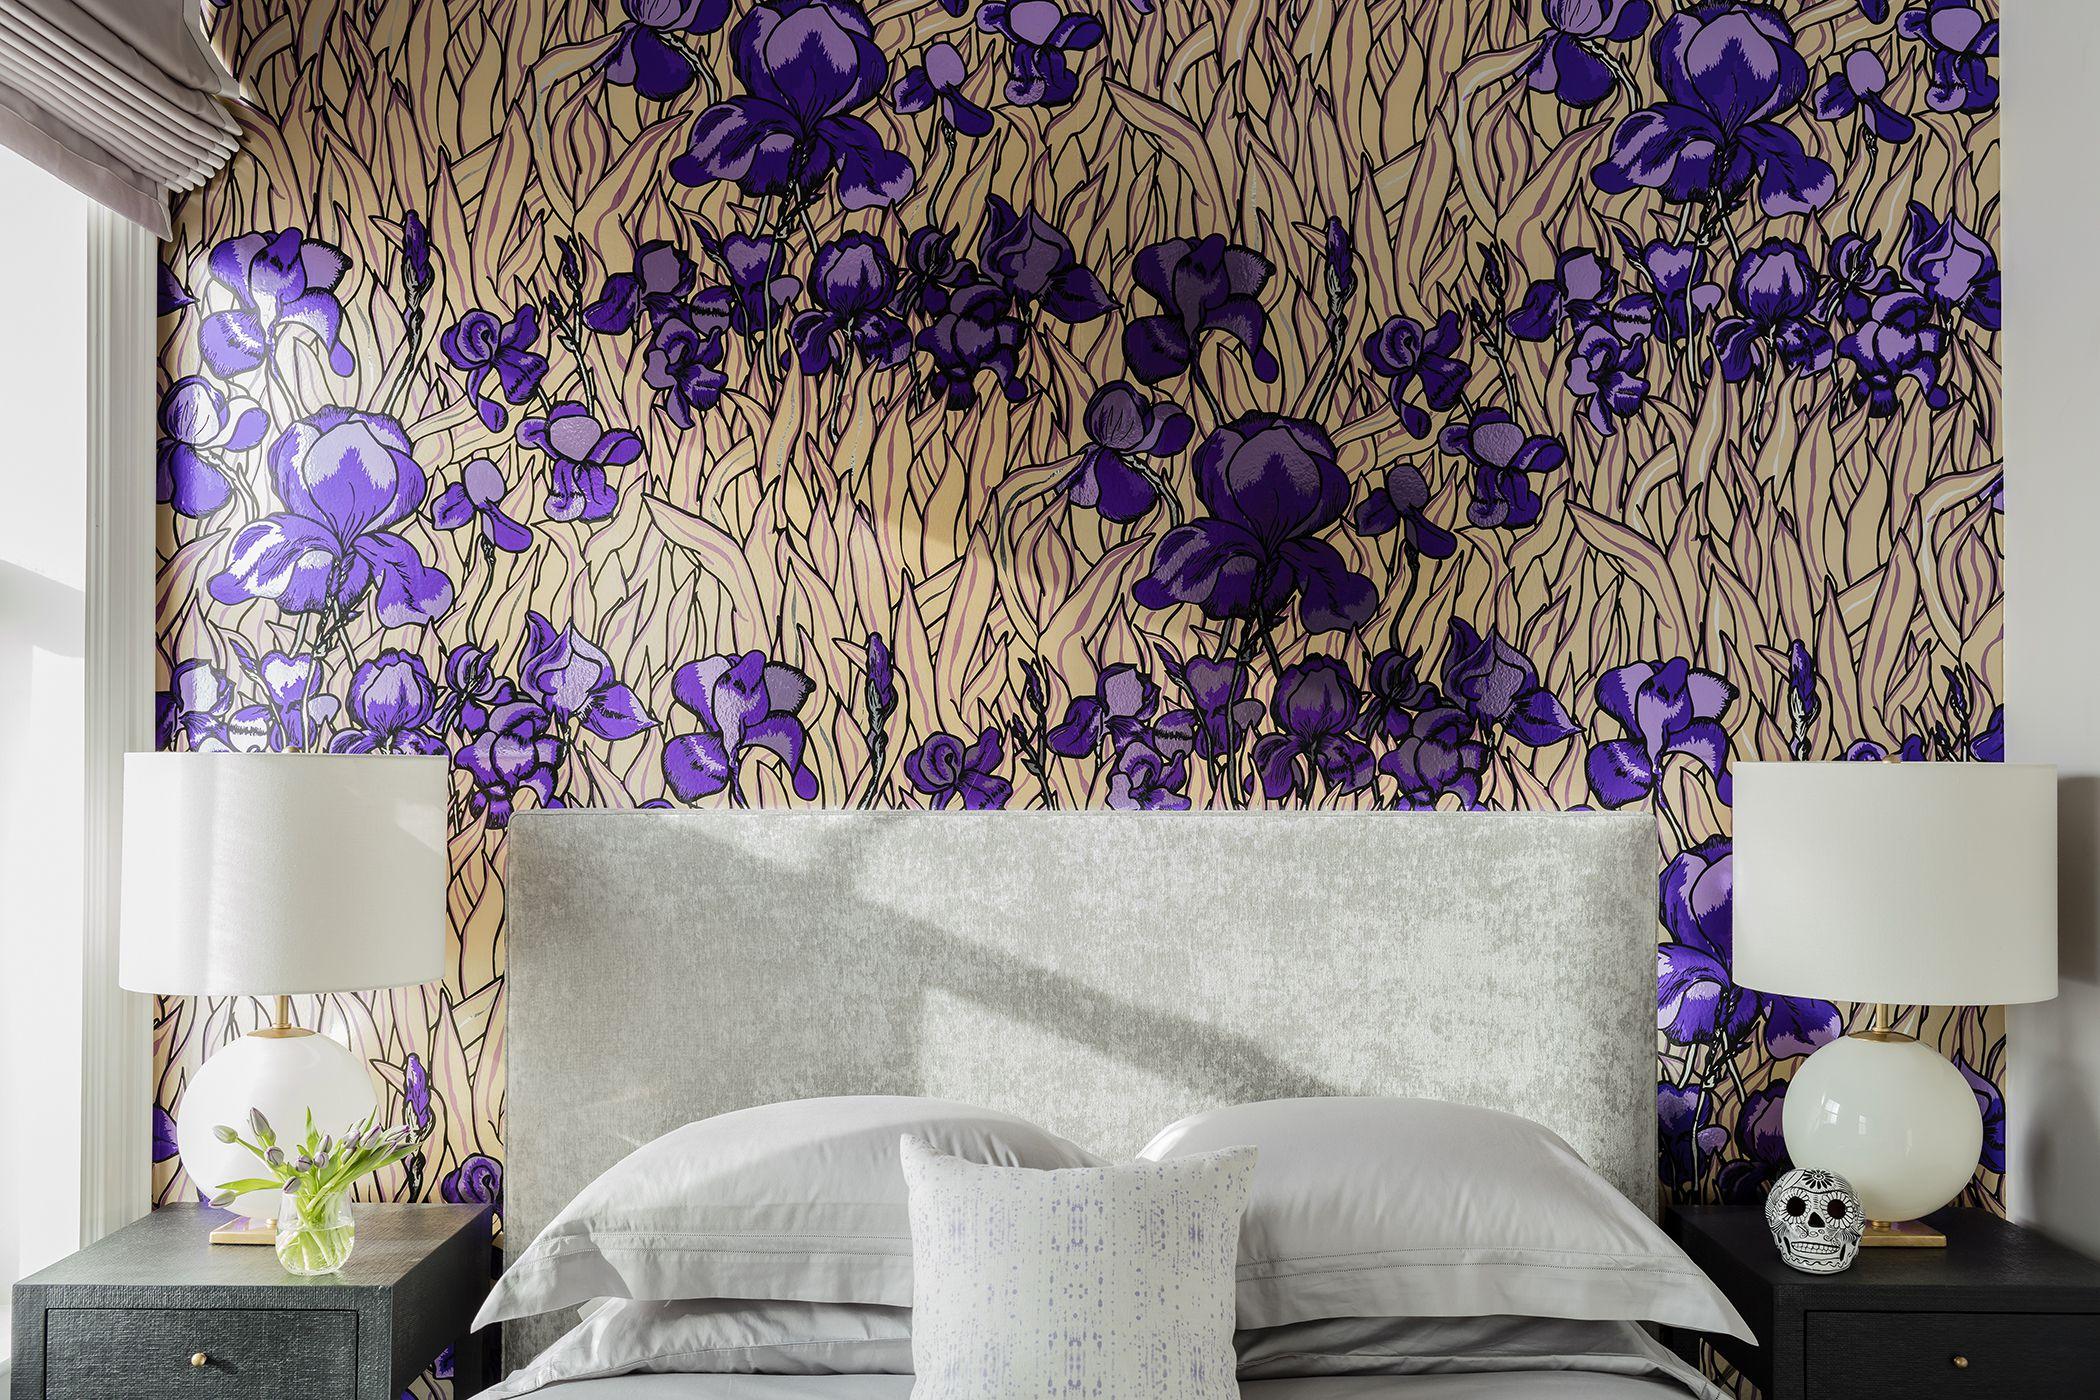 Bedroom Wallpaper Design For Wall (#2320858) - HD Wallpaper ...